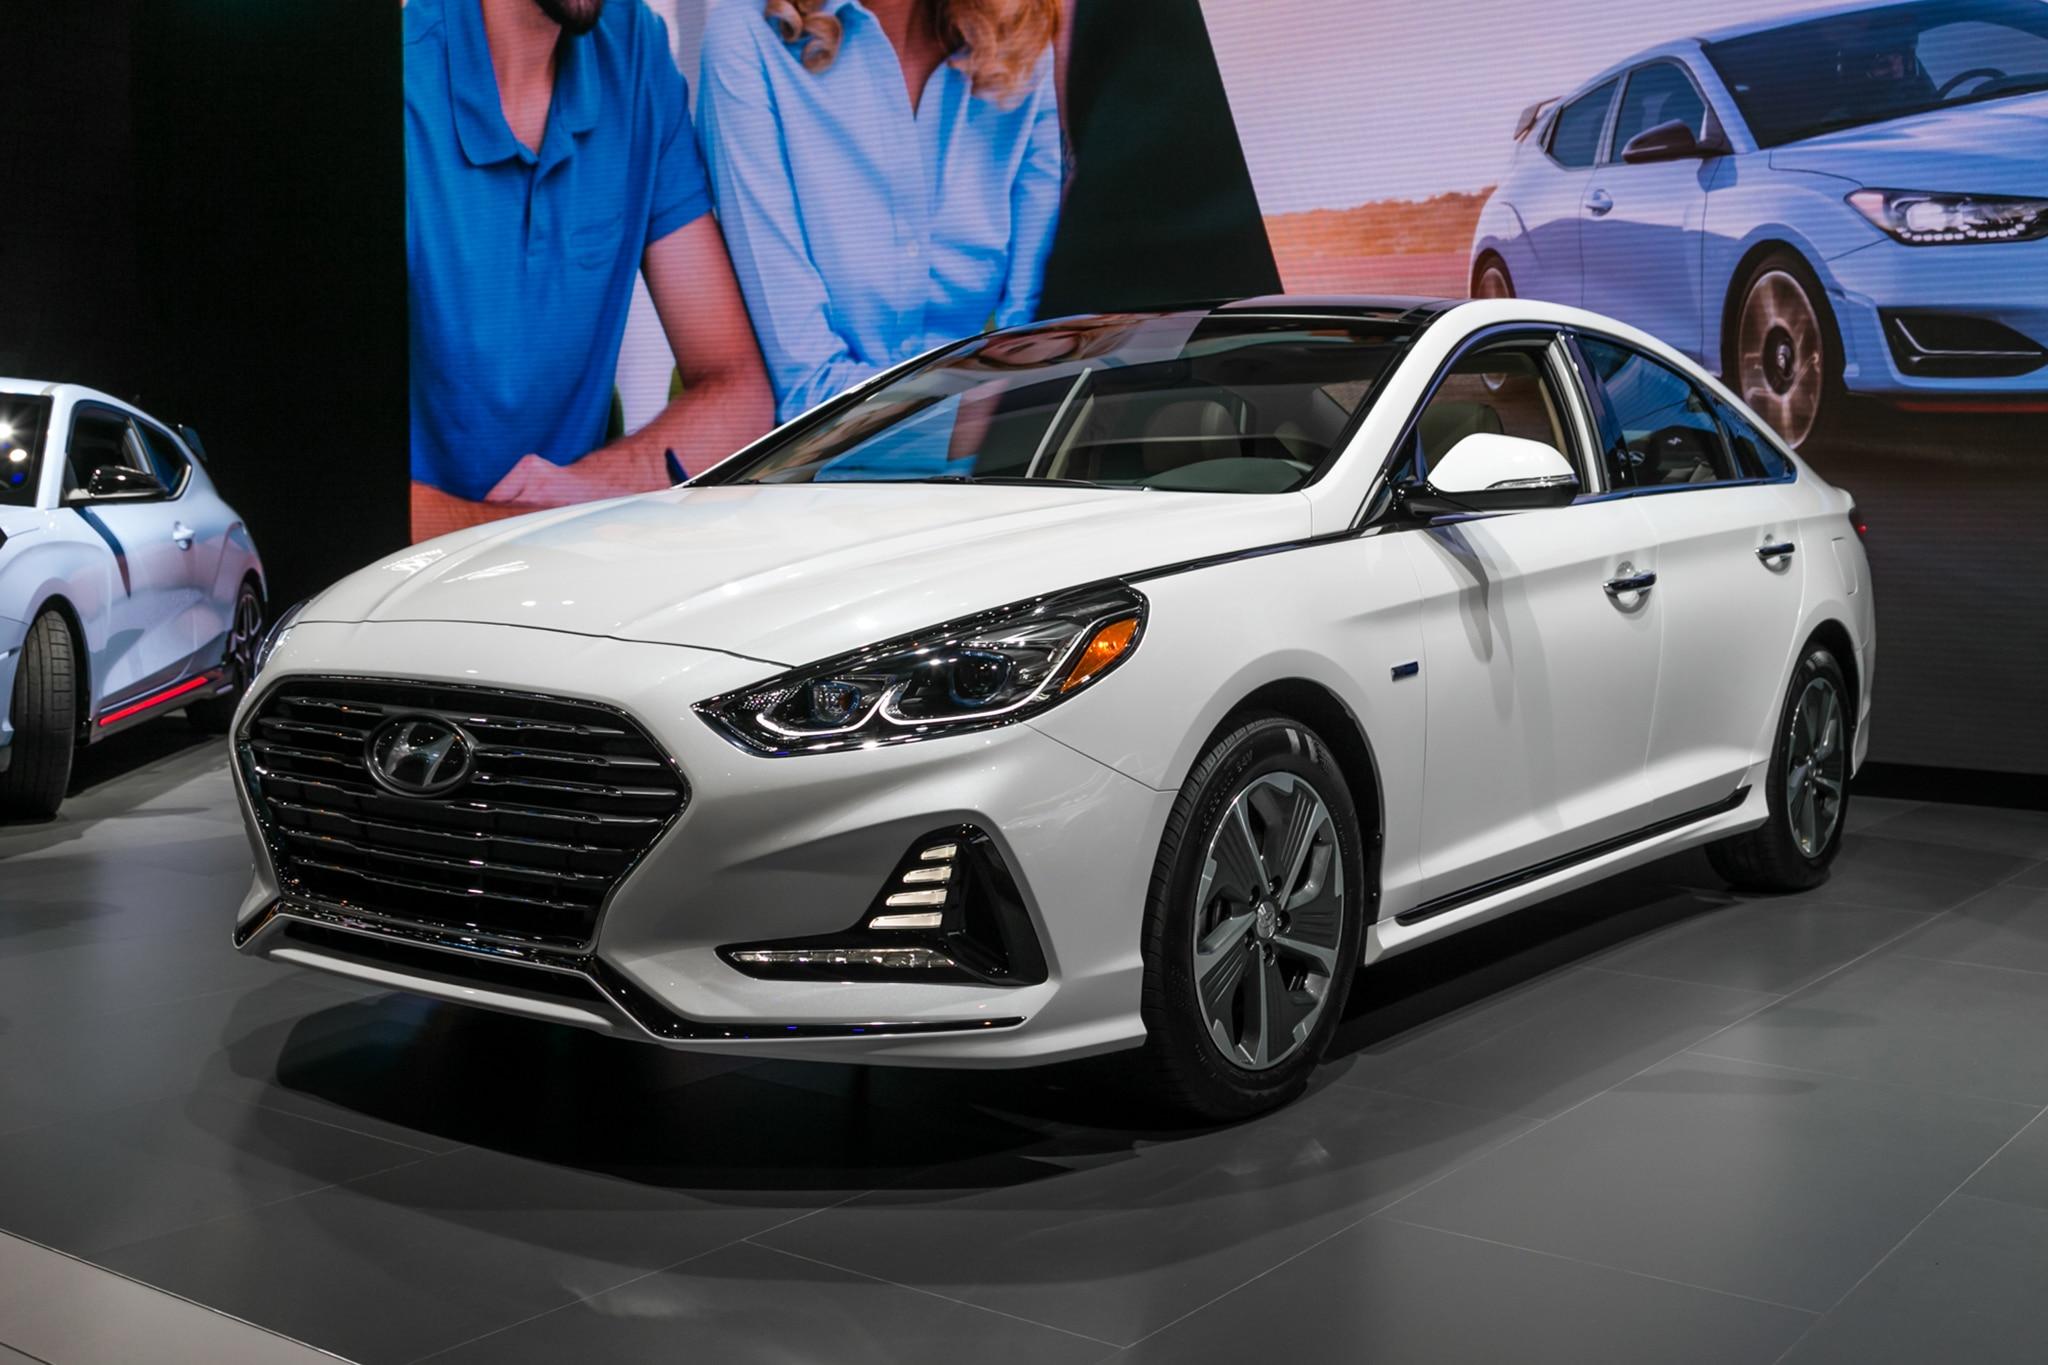 2018 Hyundai Sonata Hybrid Front Three Quarter